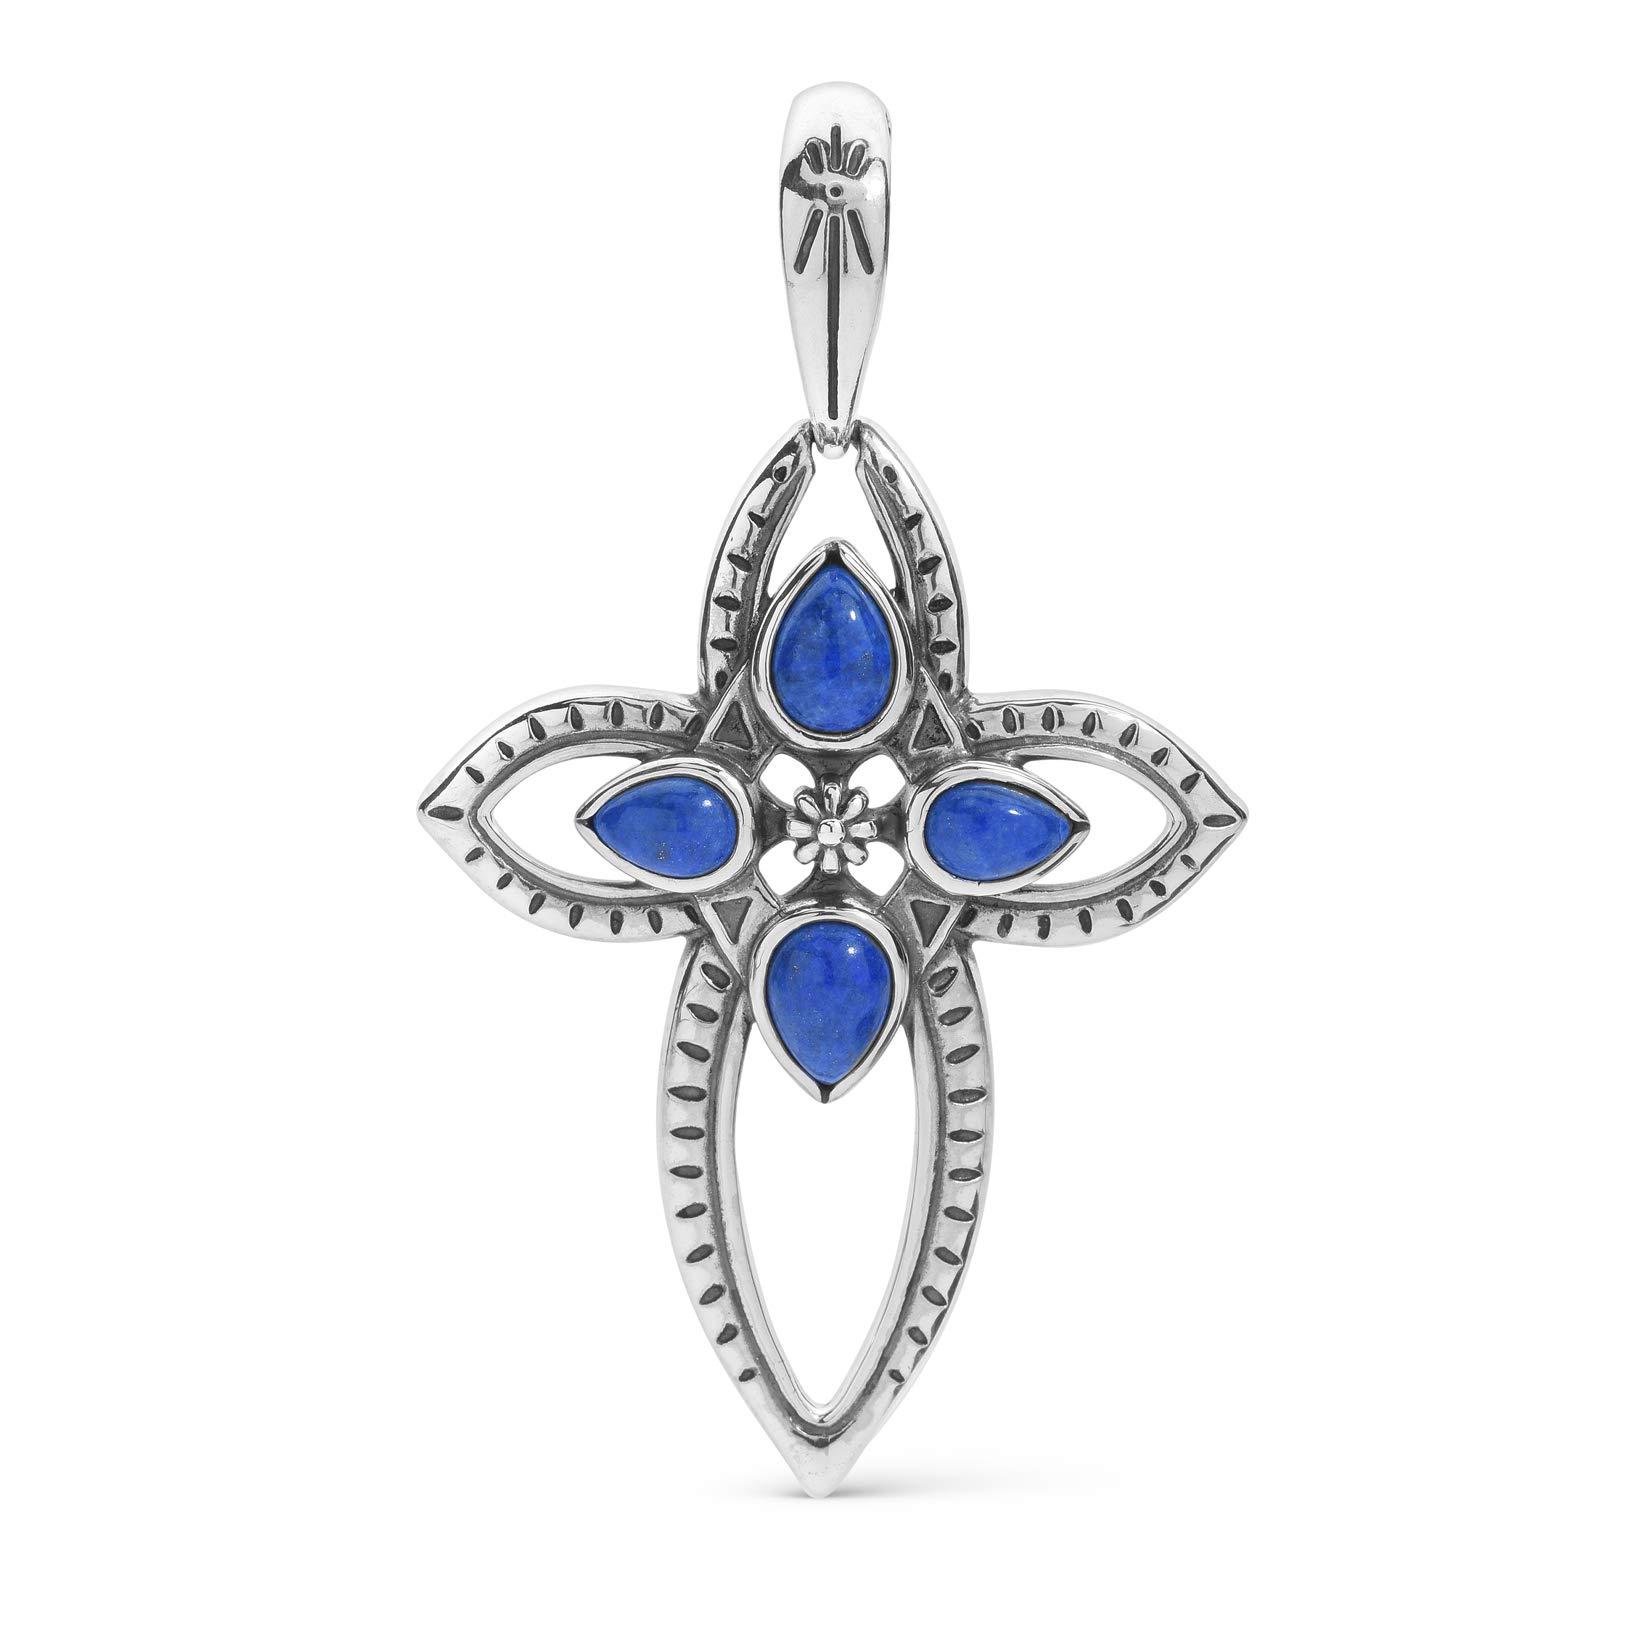 American West Sterling Silver Blue Lapis Gemstone Cross Pendant Enhancer by American West Jewelry